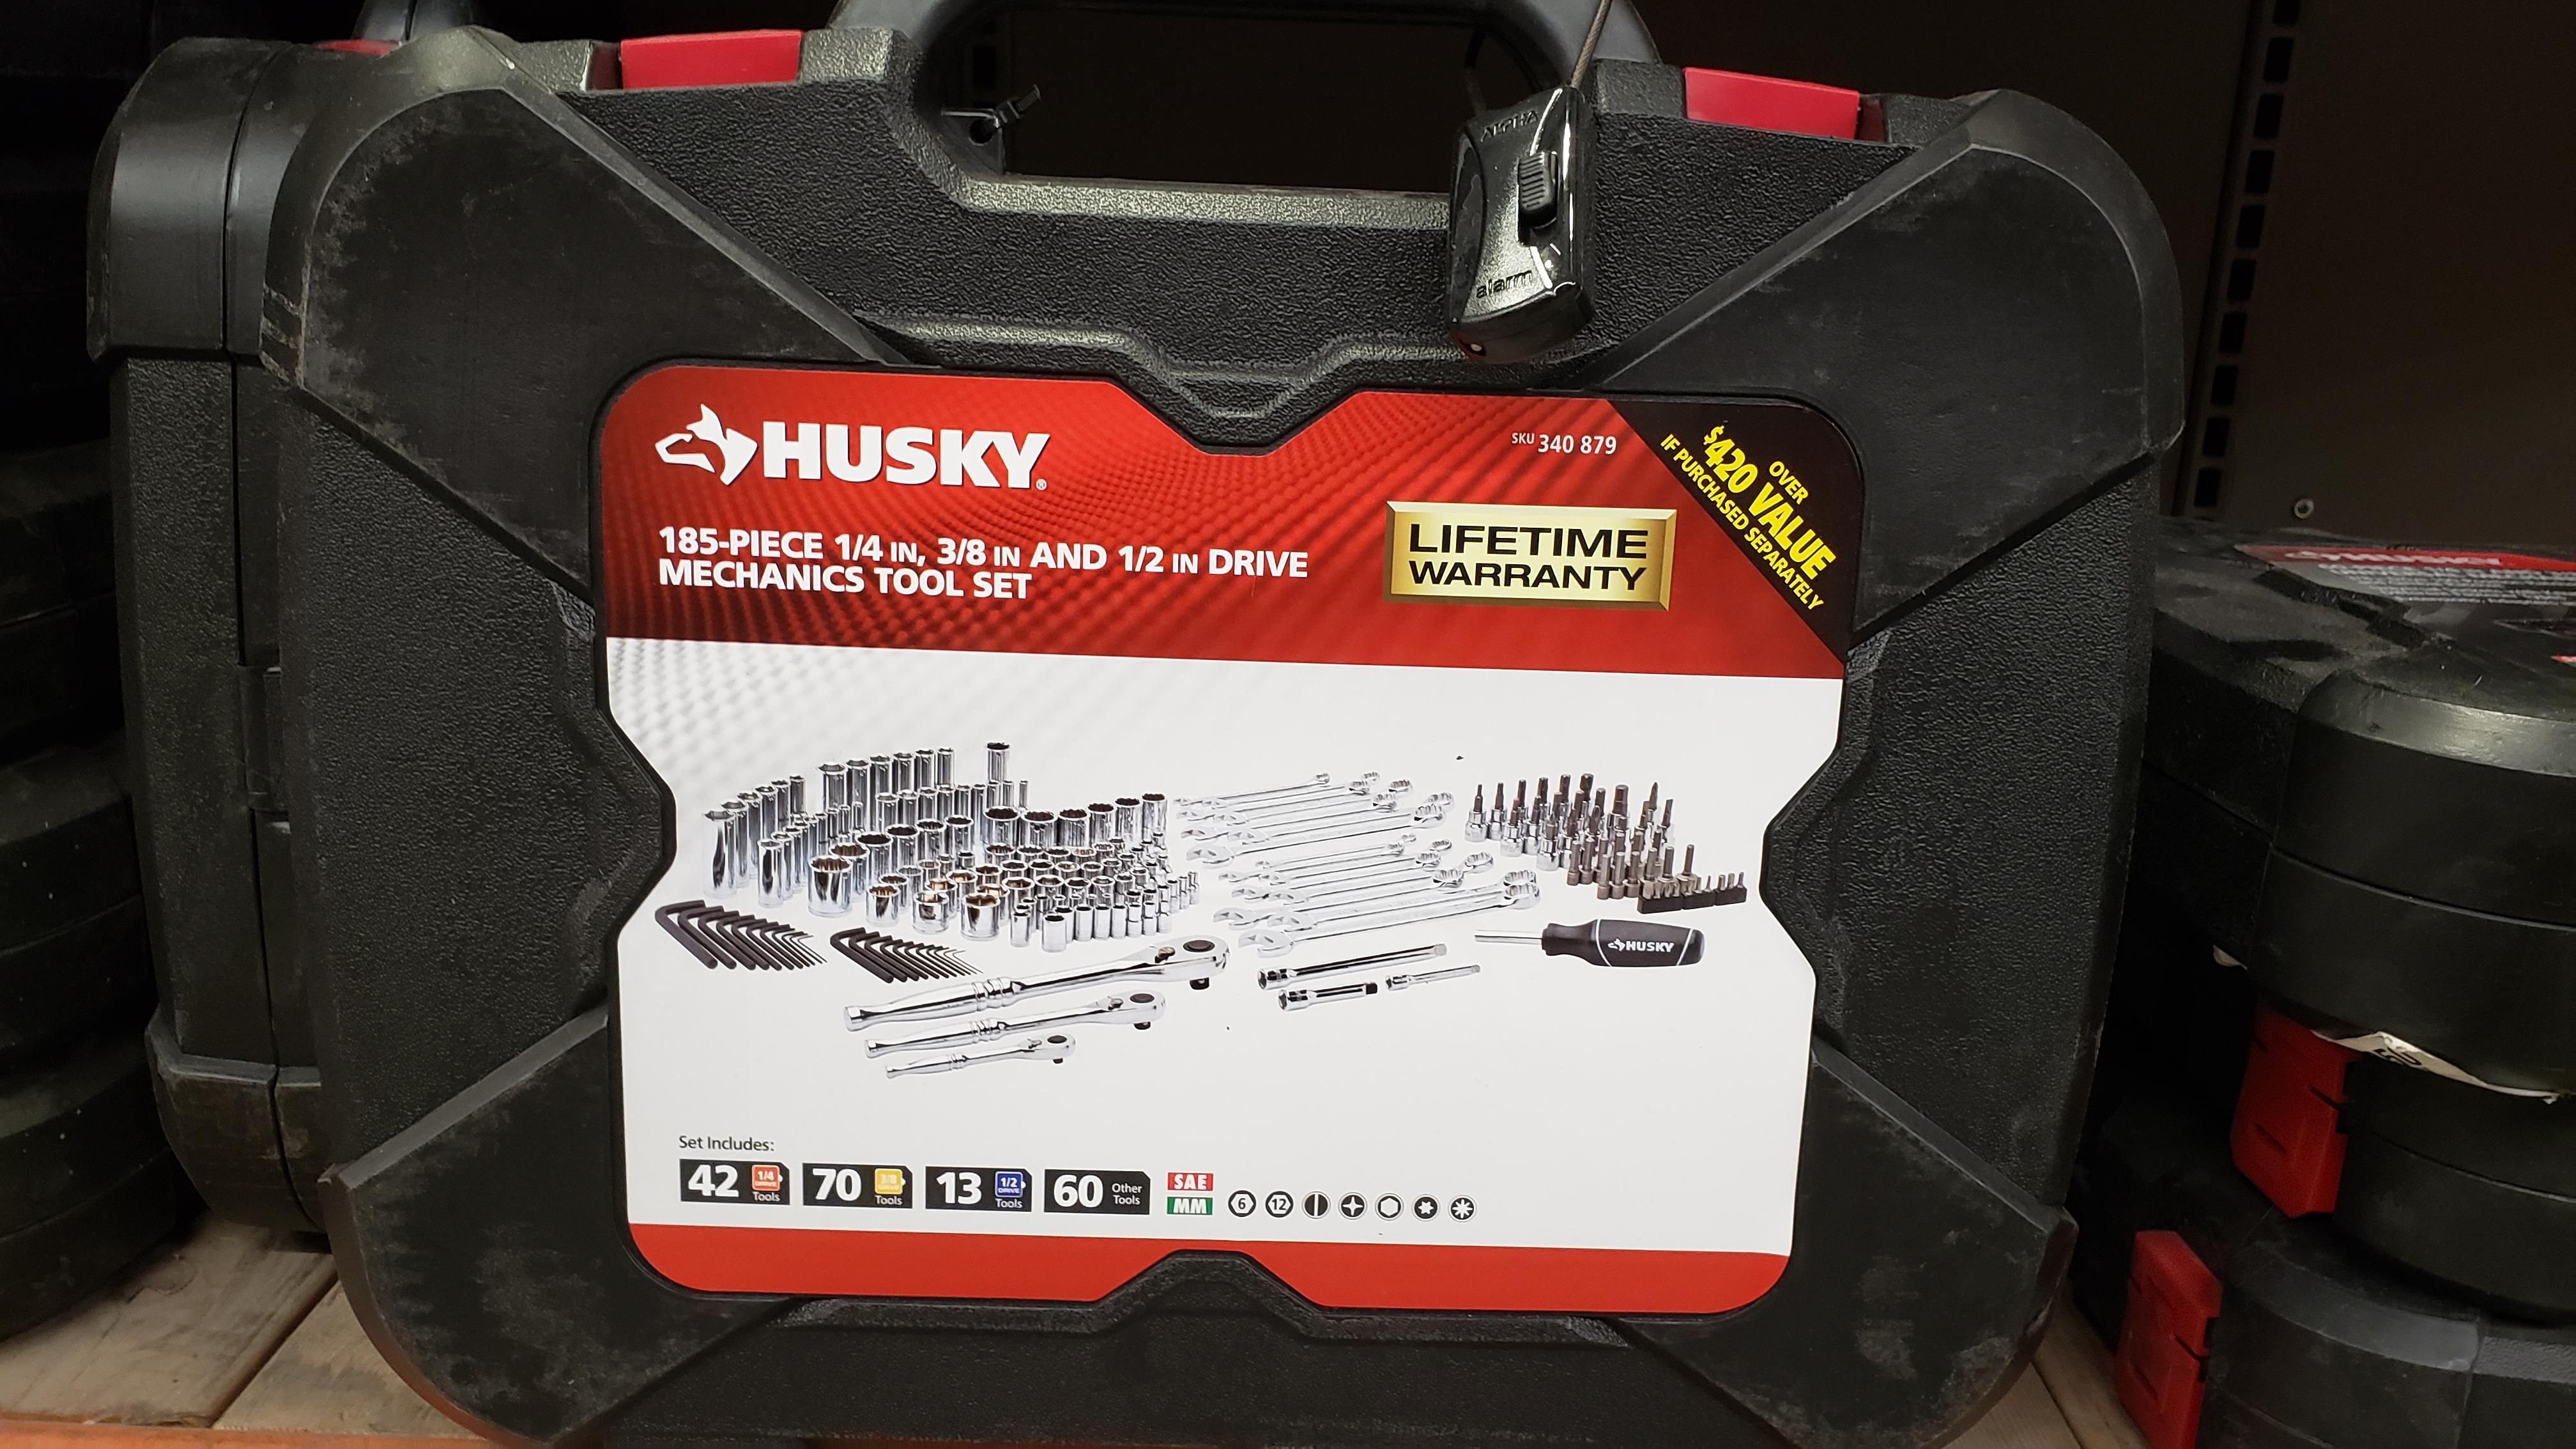 Home Depot Husky Mechanics Tool Set 185 Piece For 79 00 In